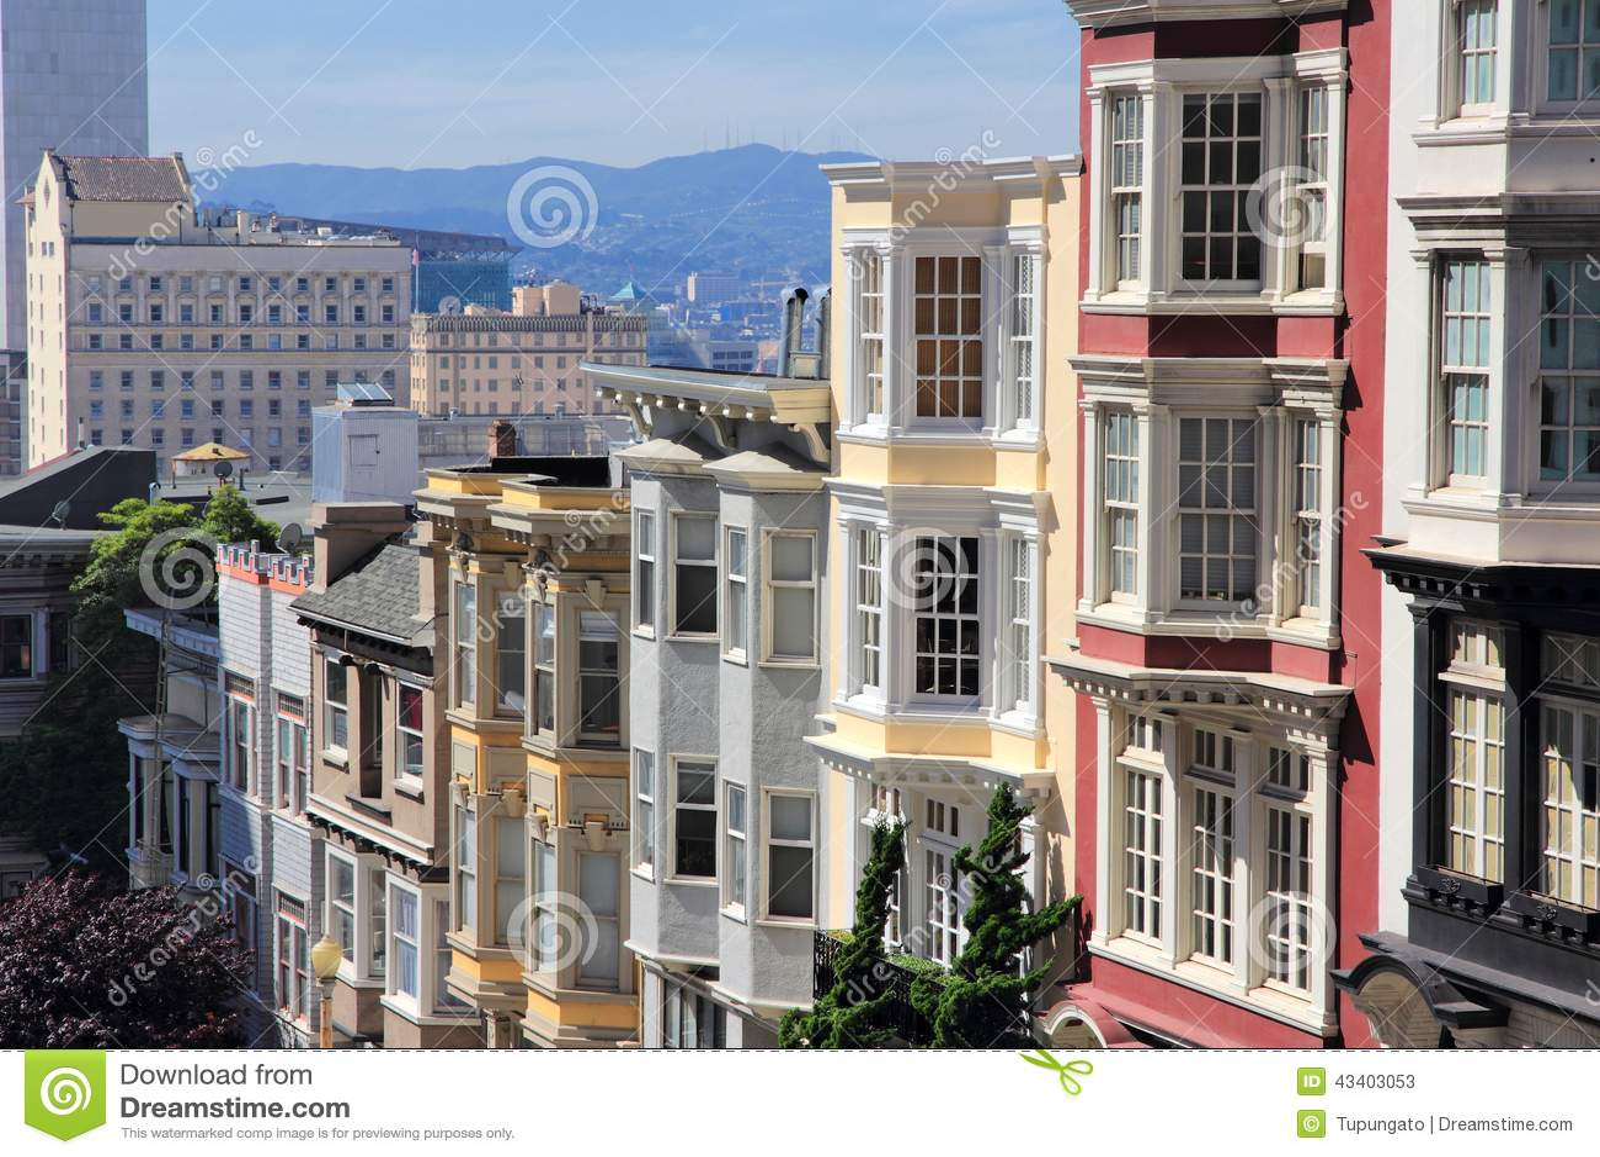 San francisco stock photo image 43403053 for Top architects san francisco